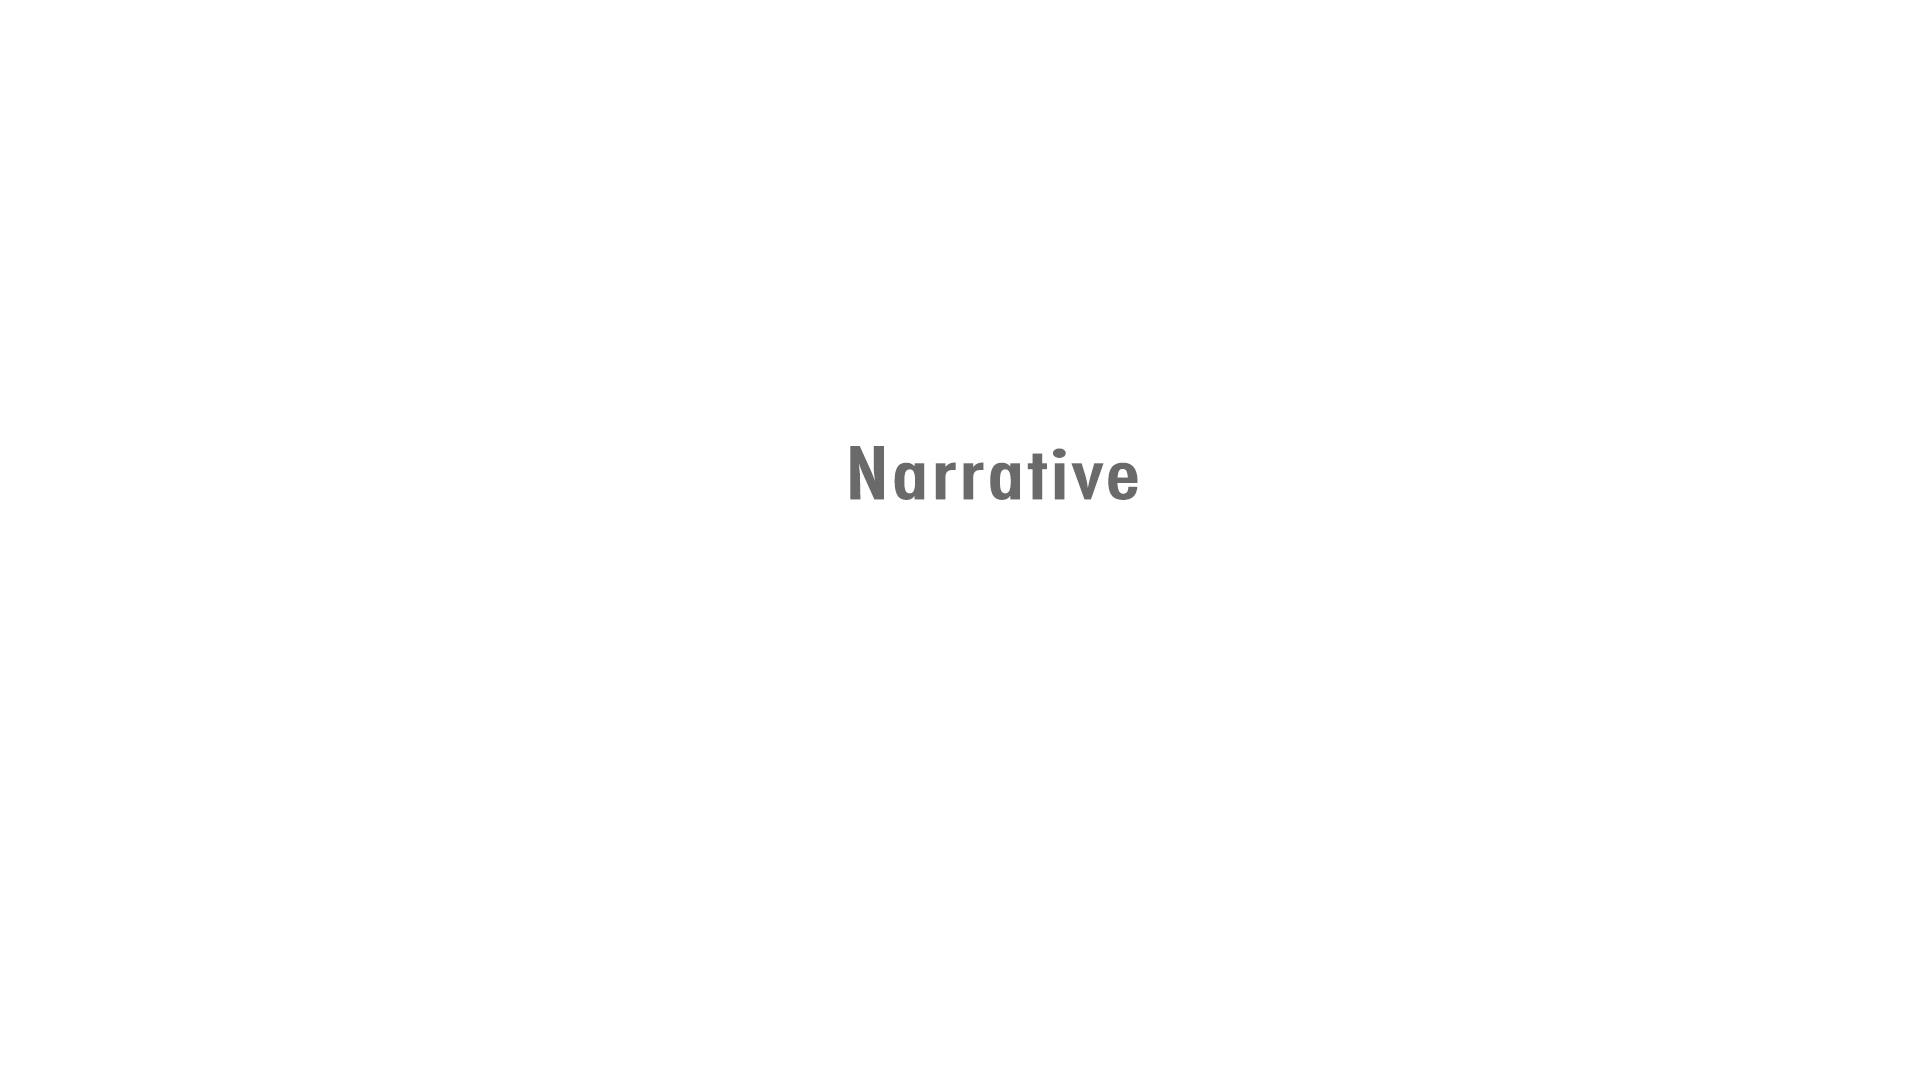 NARRATIVEtitlecard copy 2.jpg